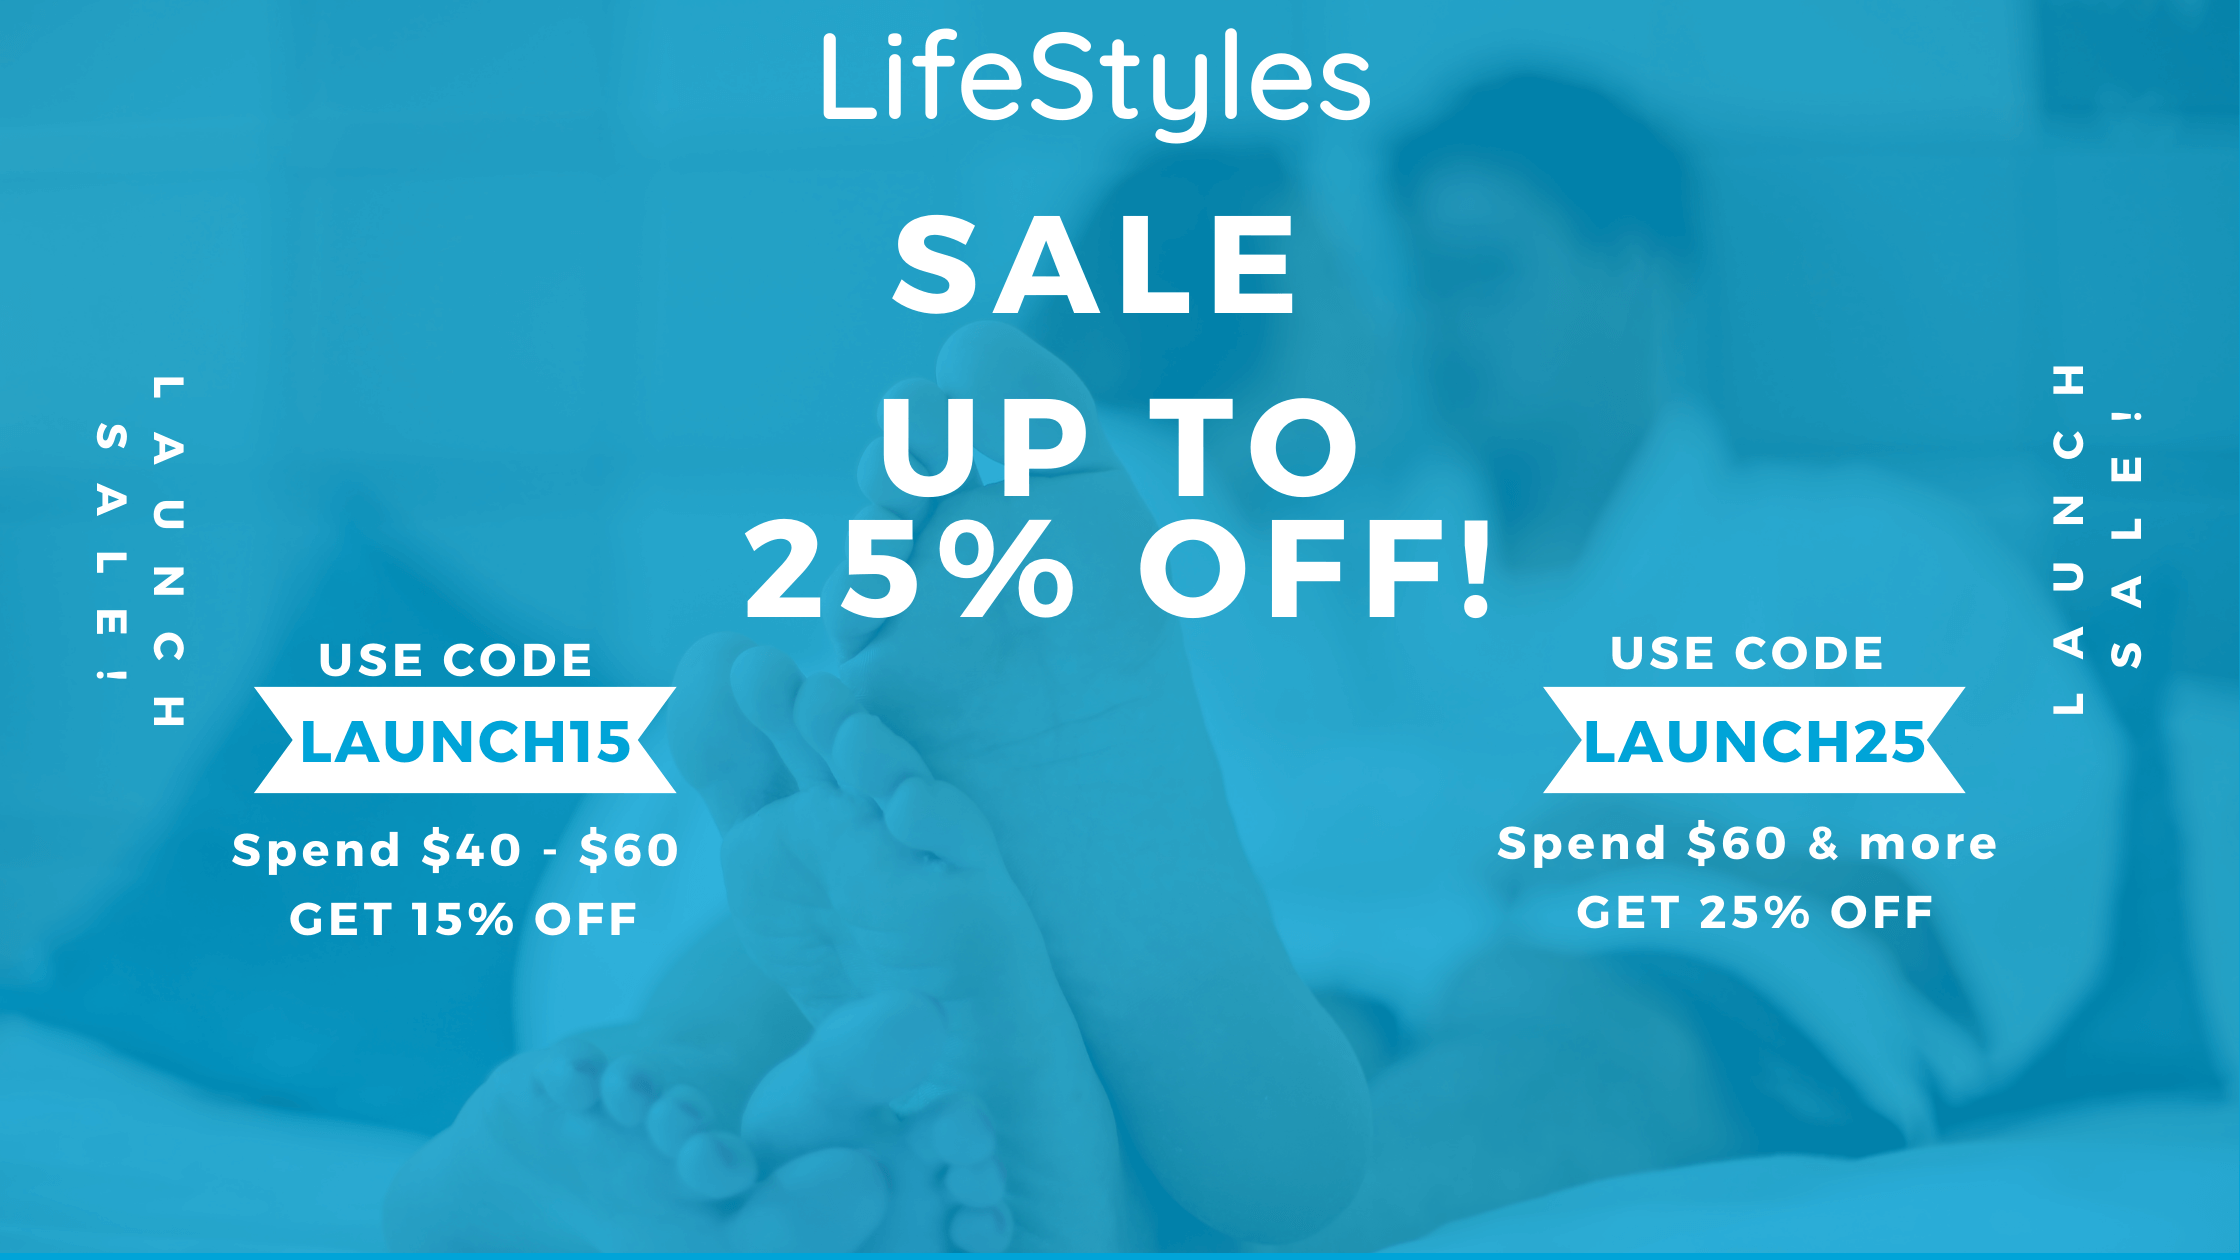 Lifestyles offer 2